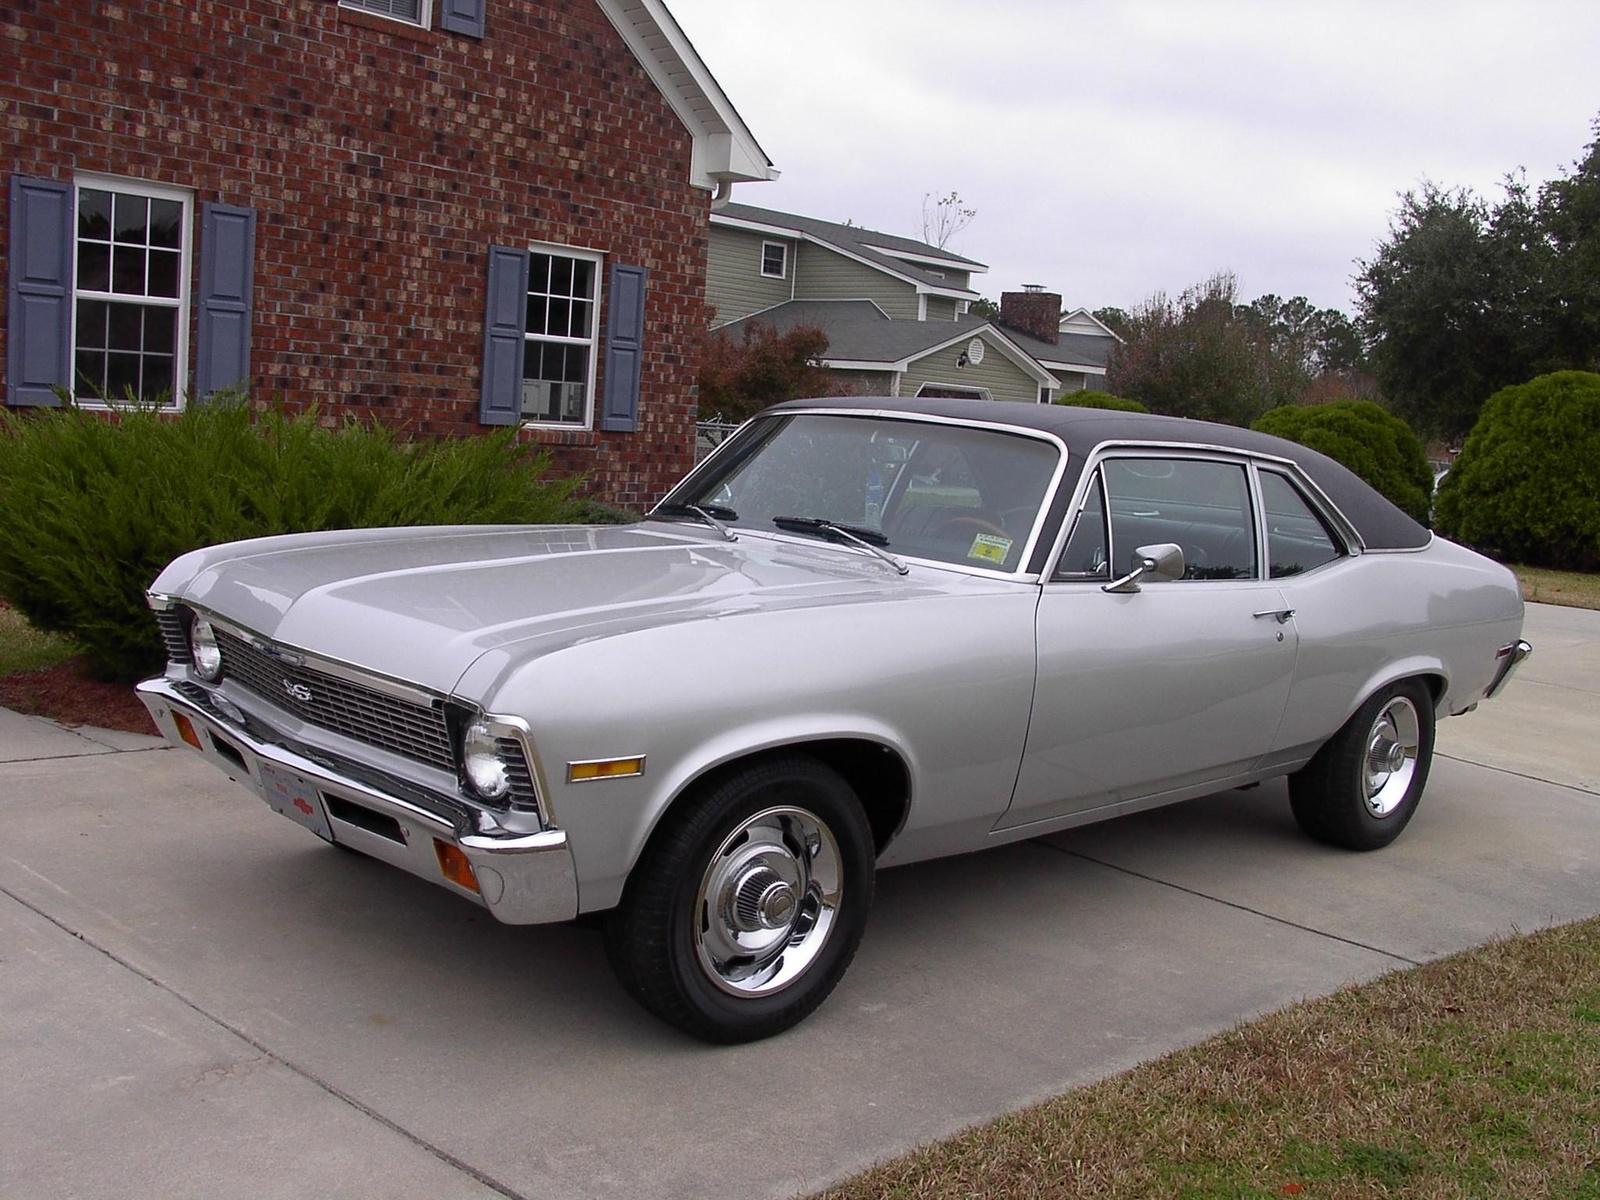 Chevy nova ss 1971 1971 chevrolet nova